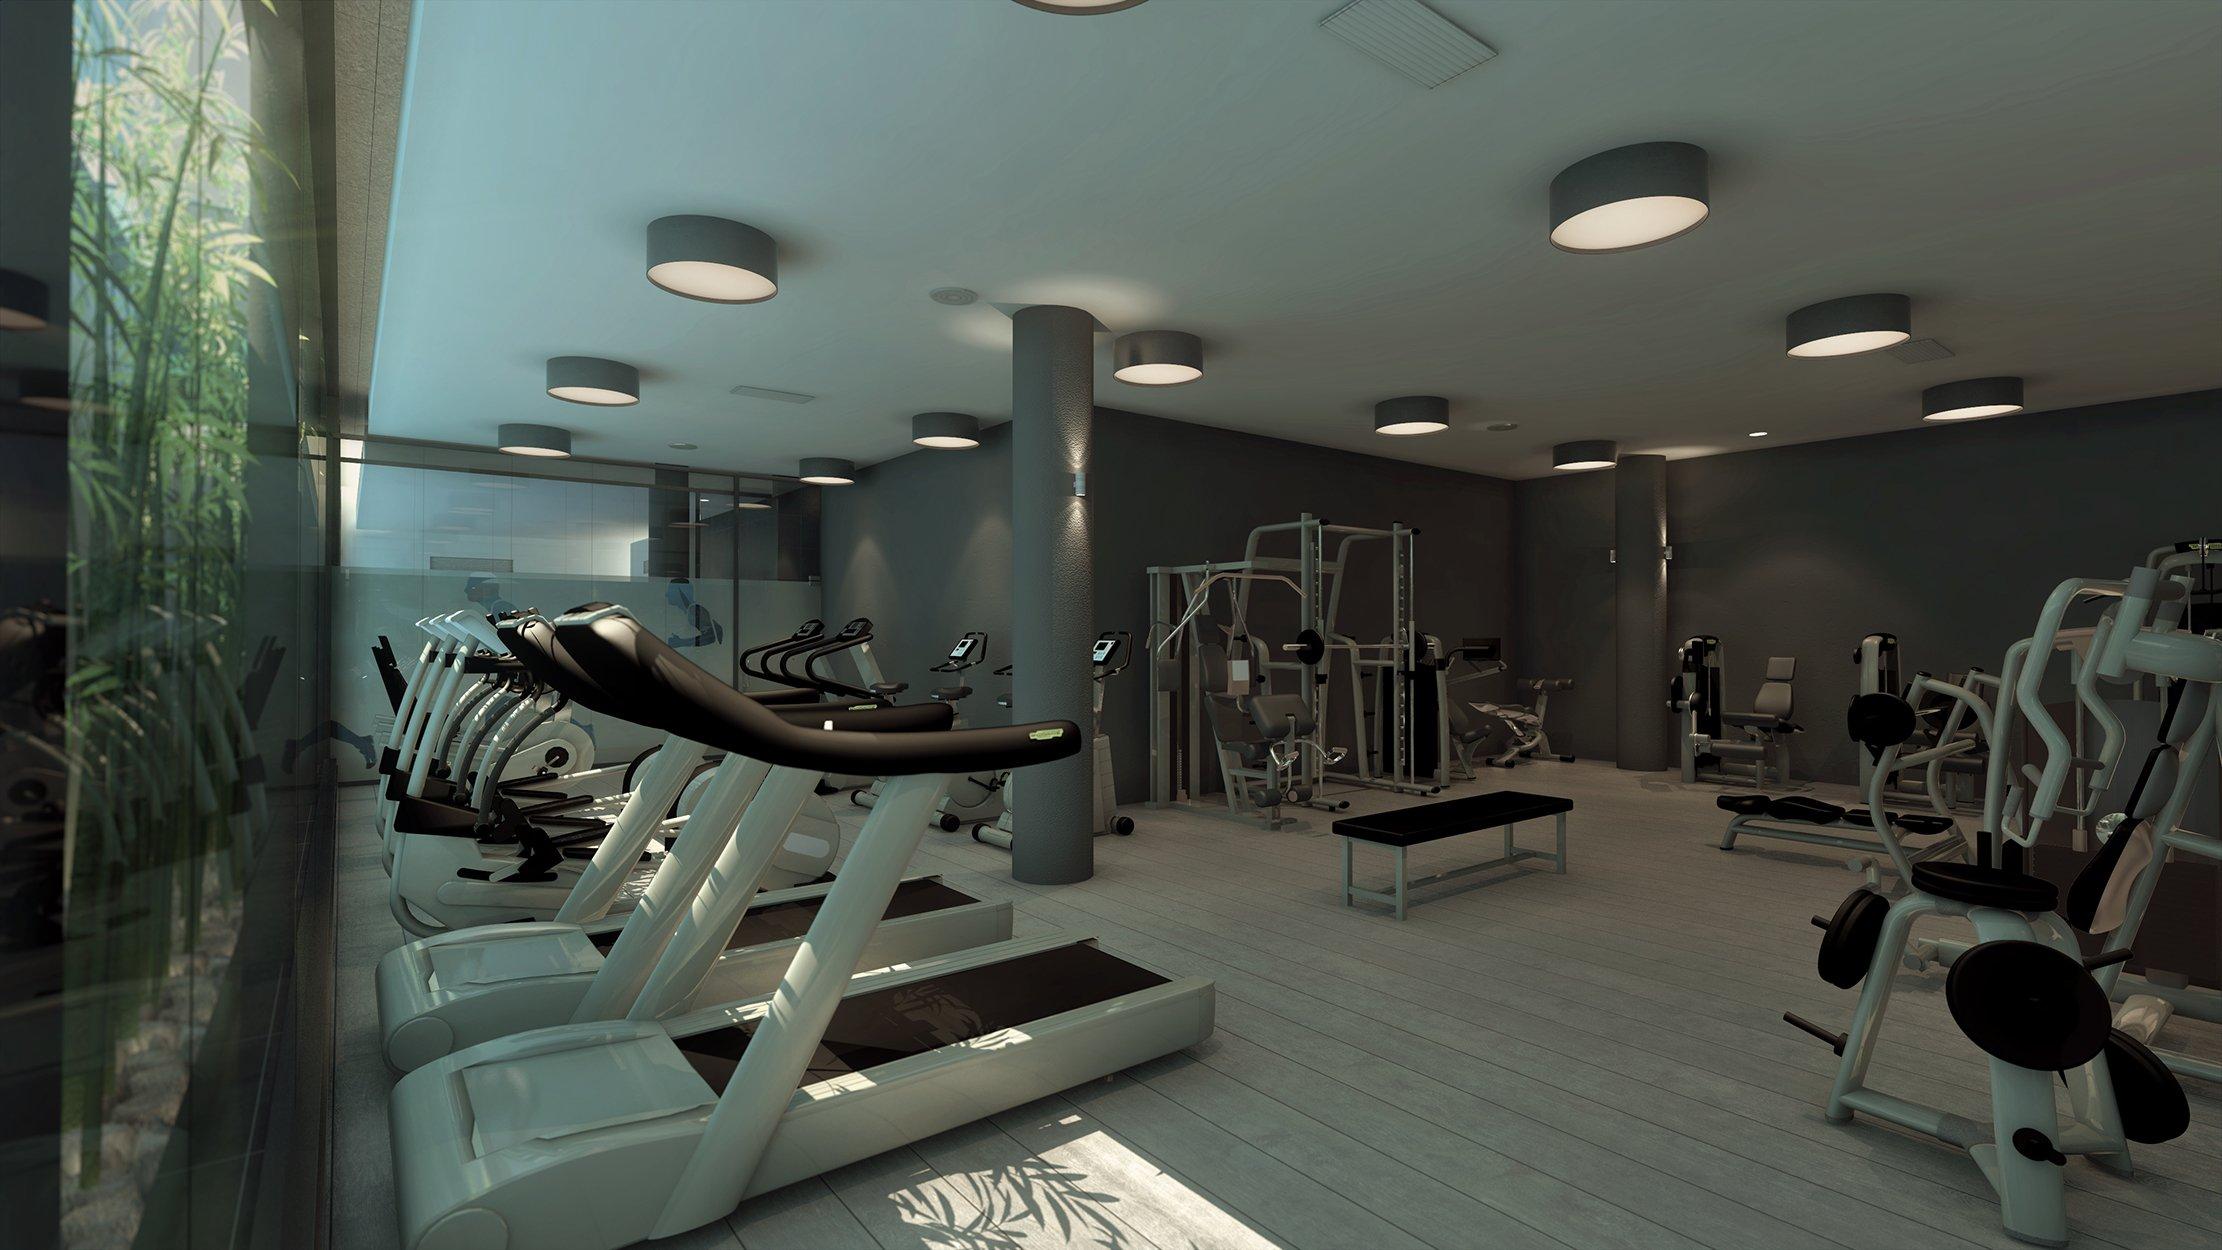 3-5 Fitness